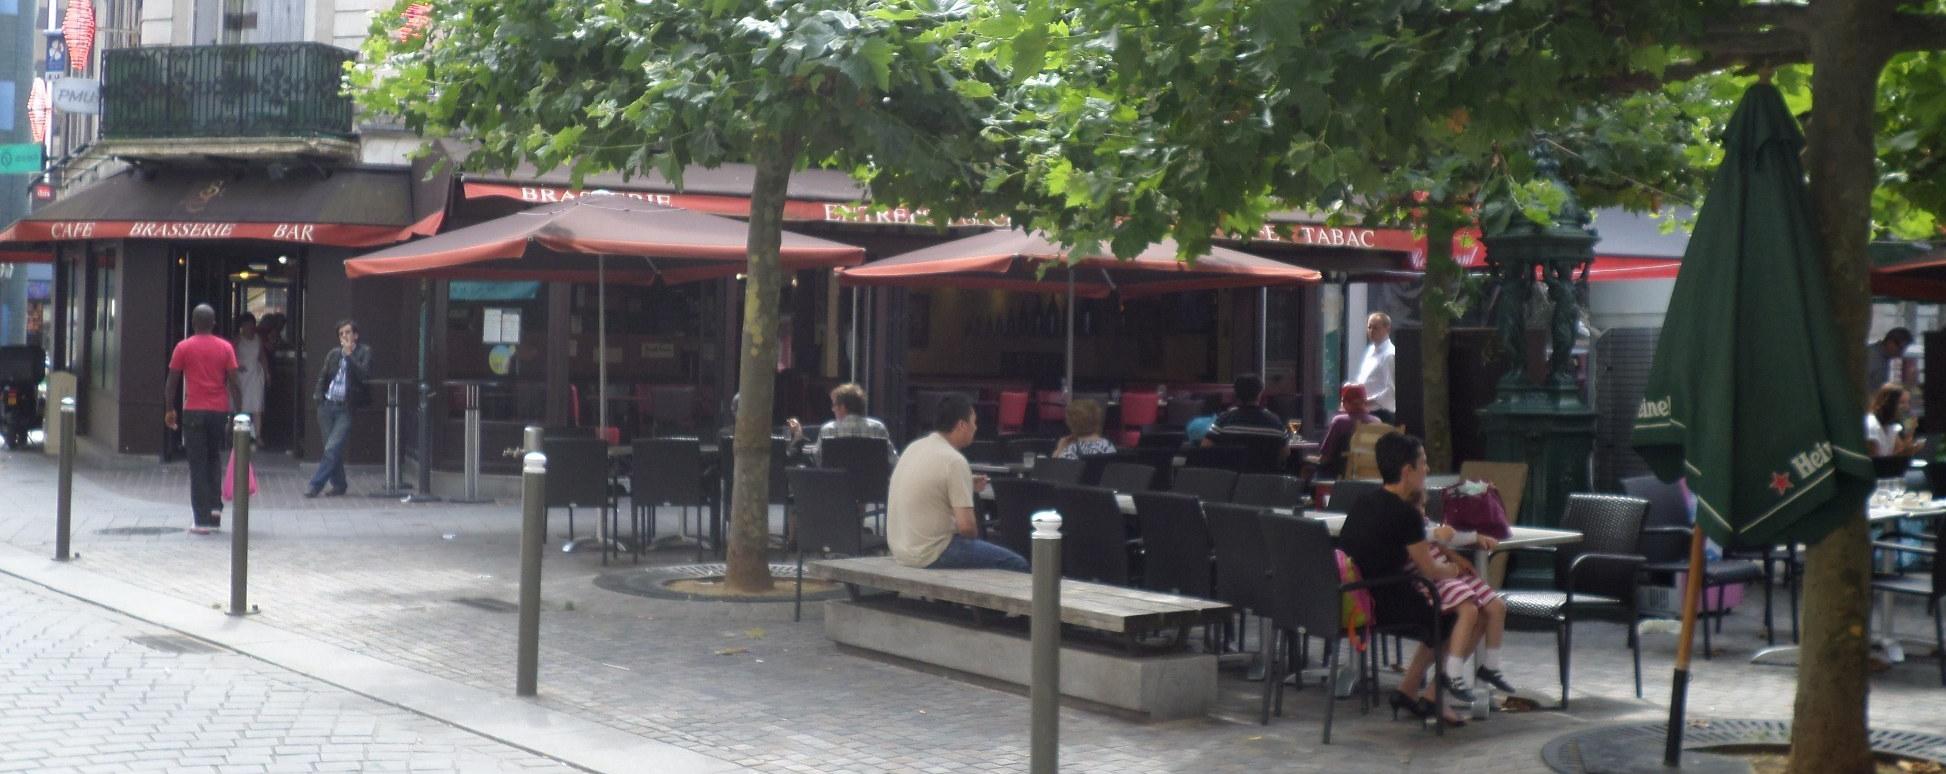 suresnes-entrepot-st-claude-brasserie